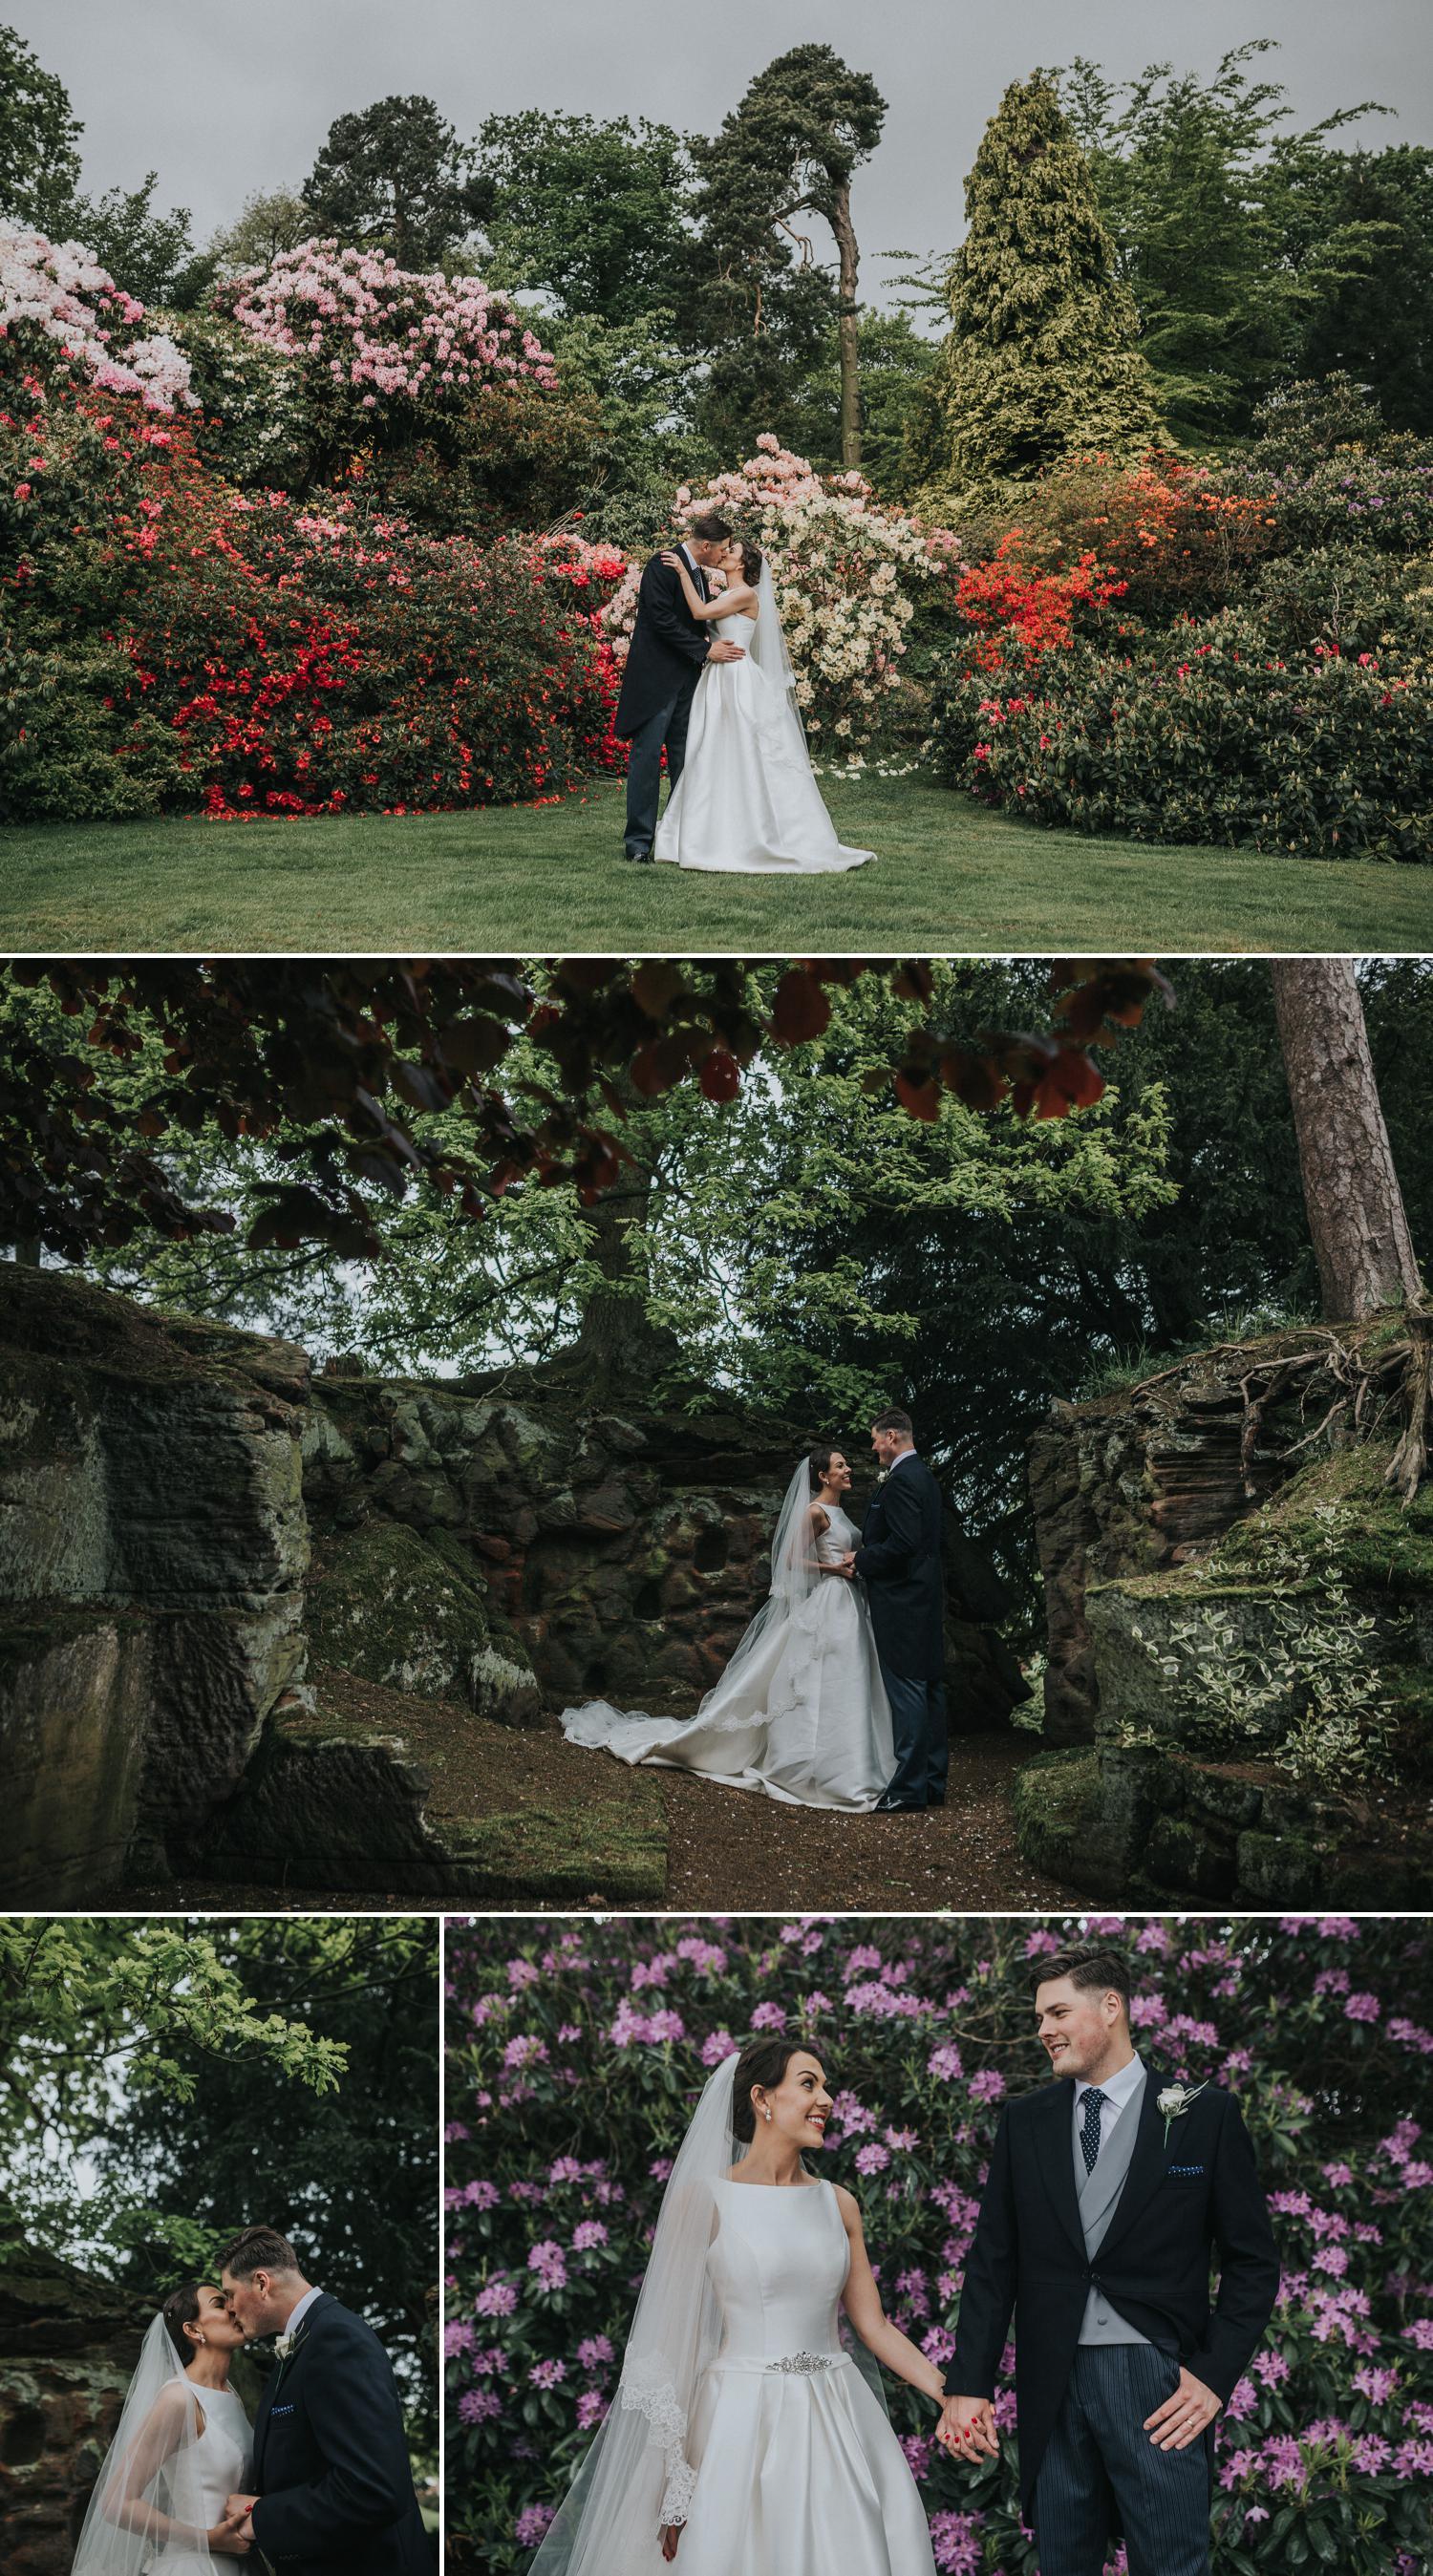 the-citadel-wedding-photography 13.jpg